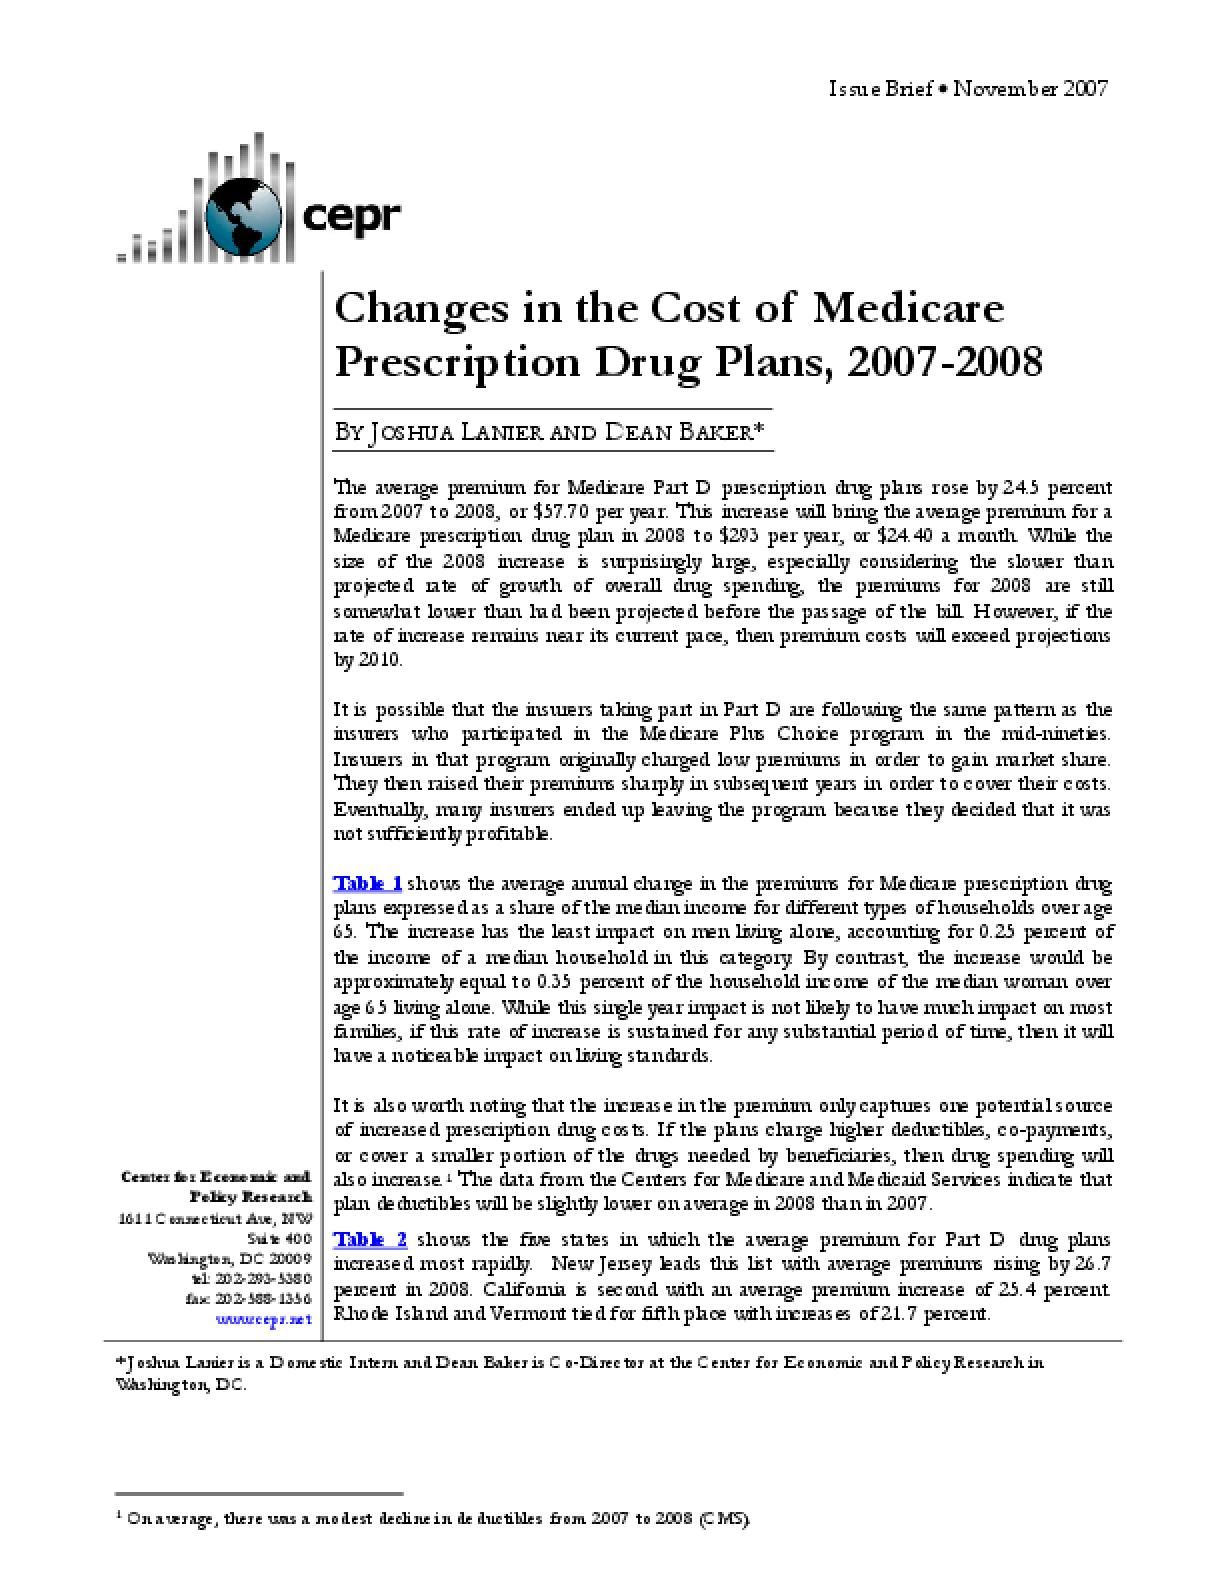 Changes in the Cost of Medicare Prescription Drug Plans, 2007-2008